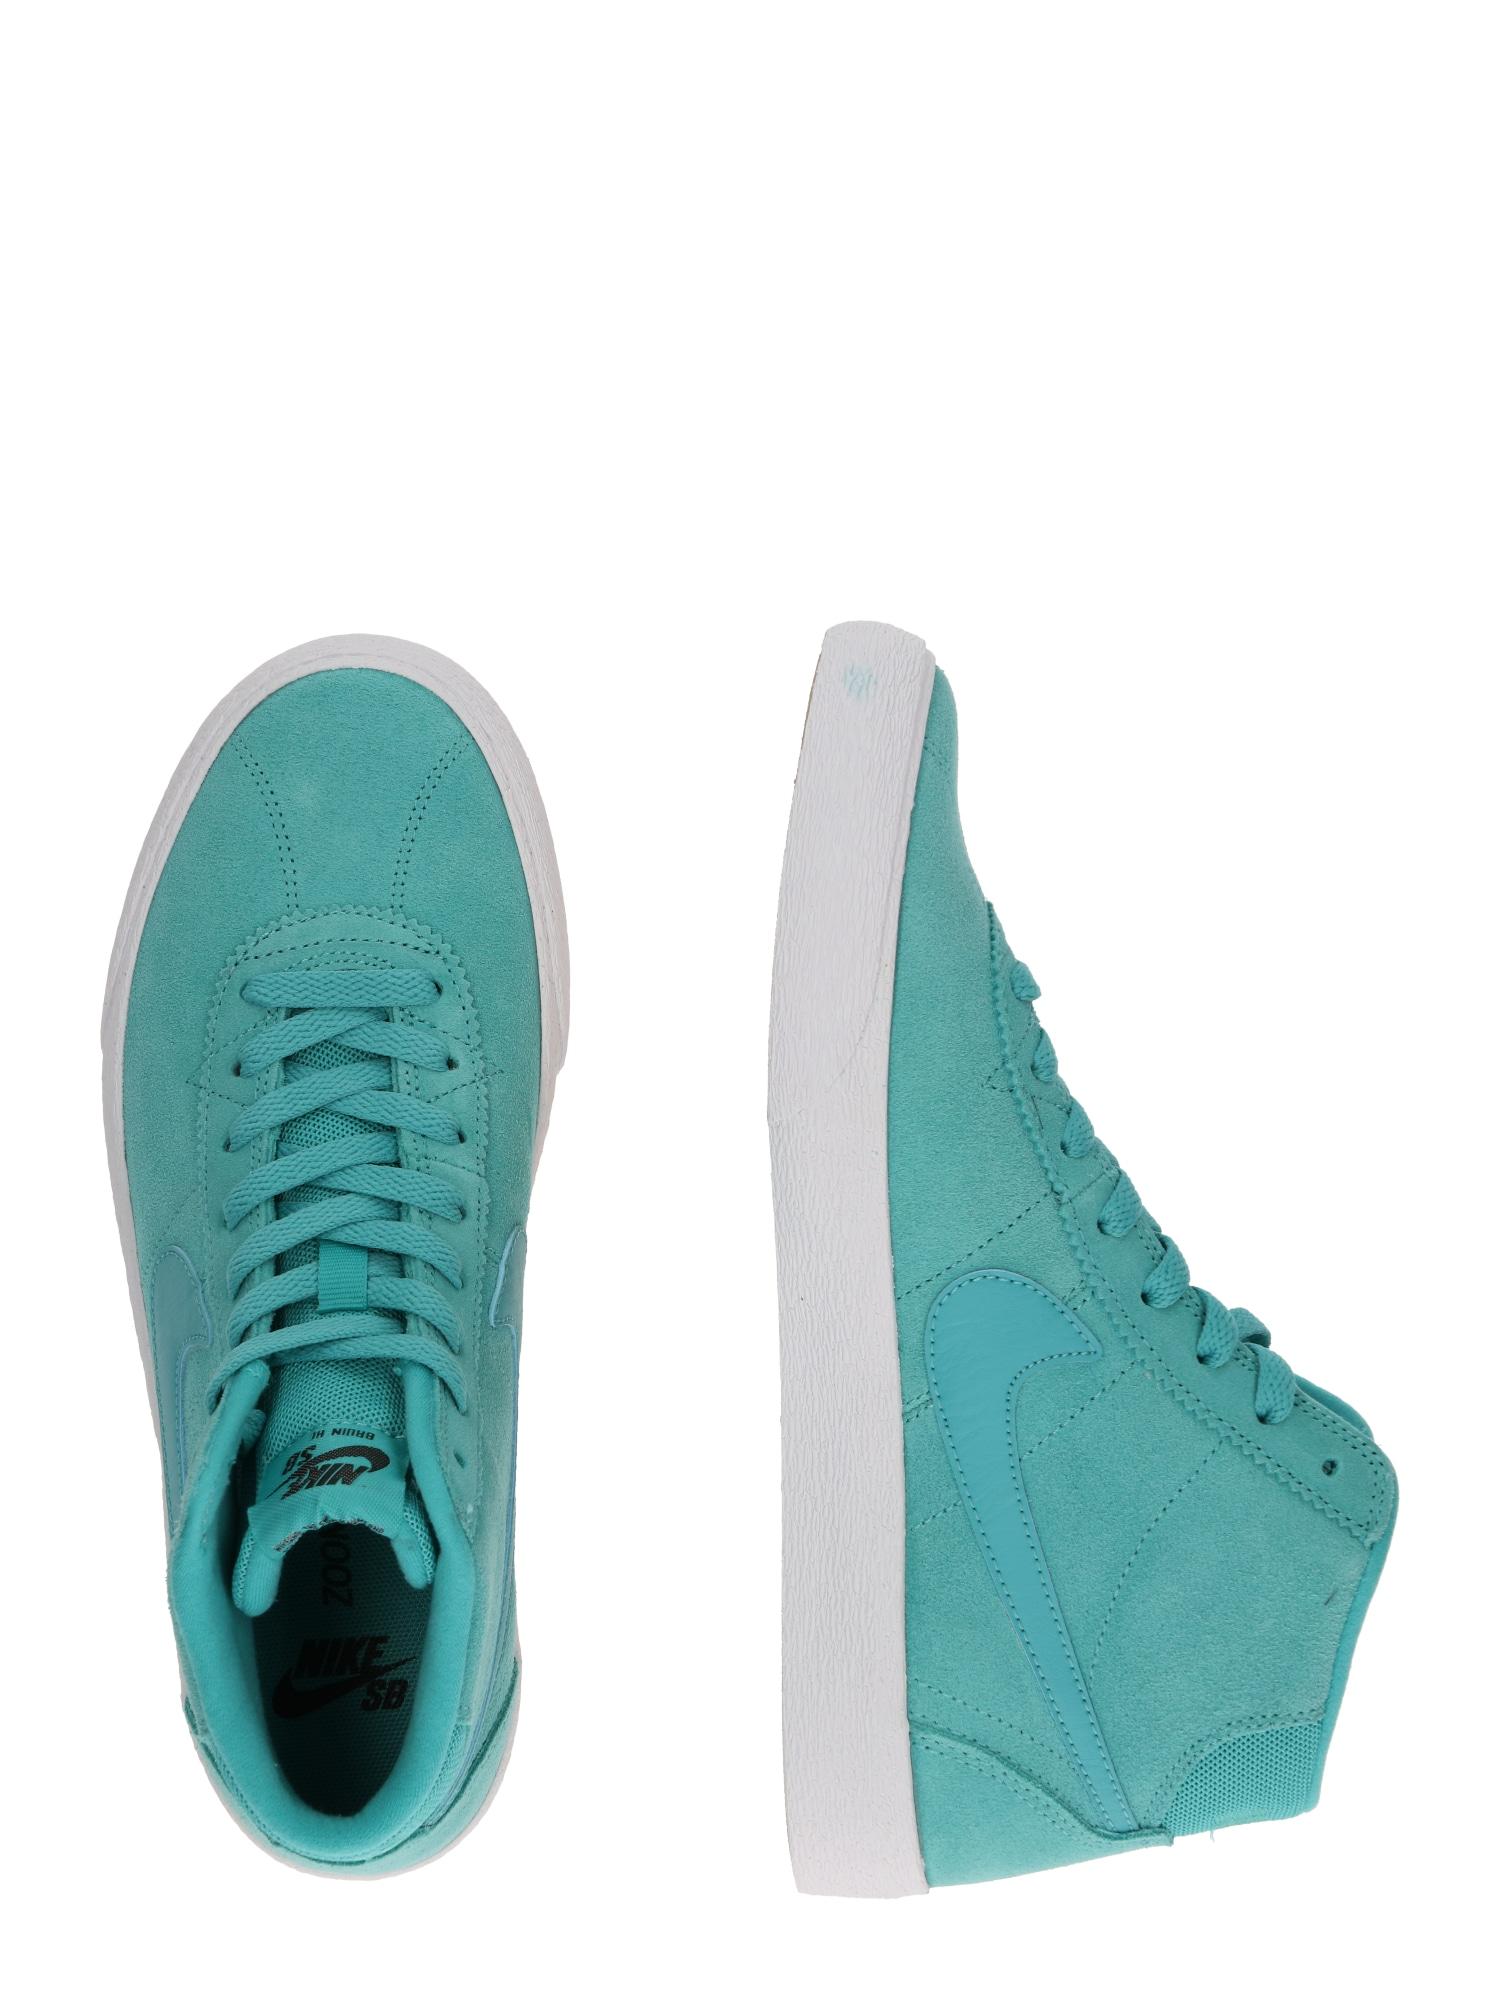 Nike SB, Damen Sneakers hoog Nike SB Bruin Hi Skateboarding Shoe, blauw / turquoise